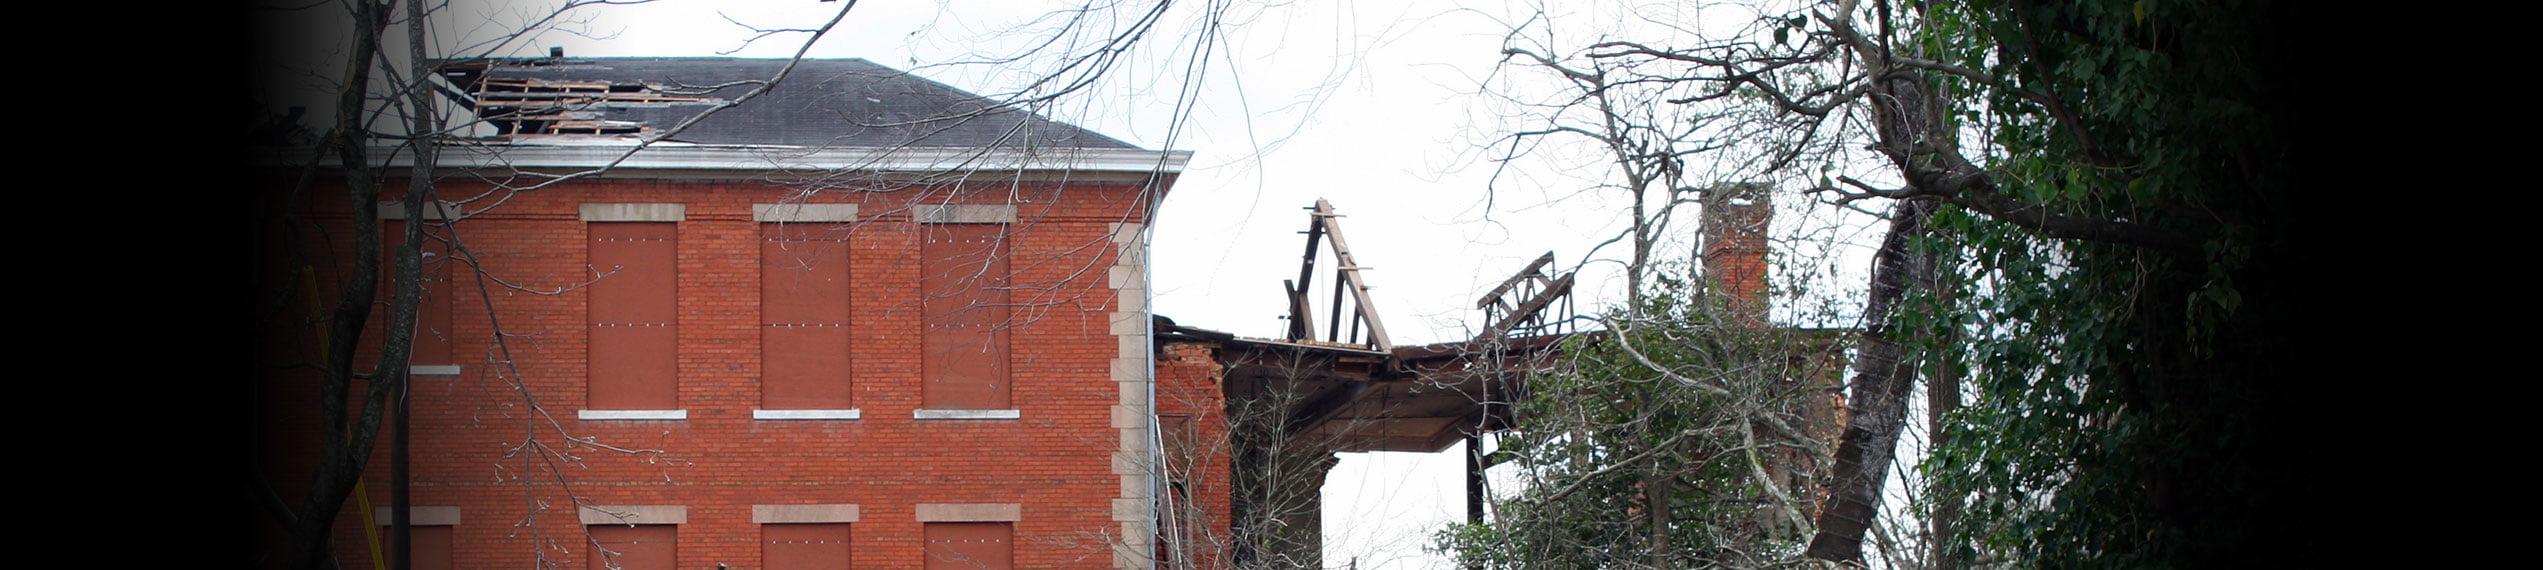 Wind & Storm Damage Repairs in Paul Davis Restoration of Allegheny County